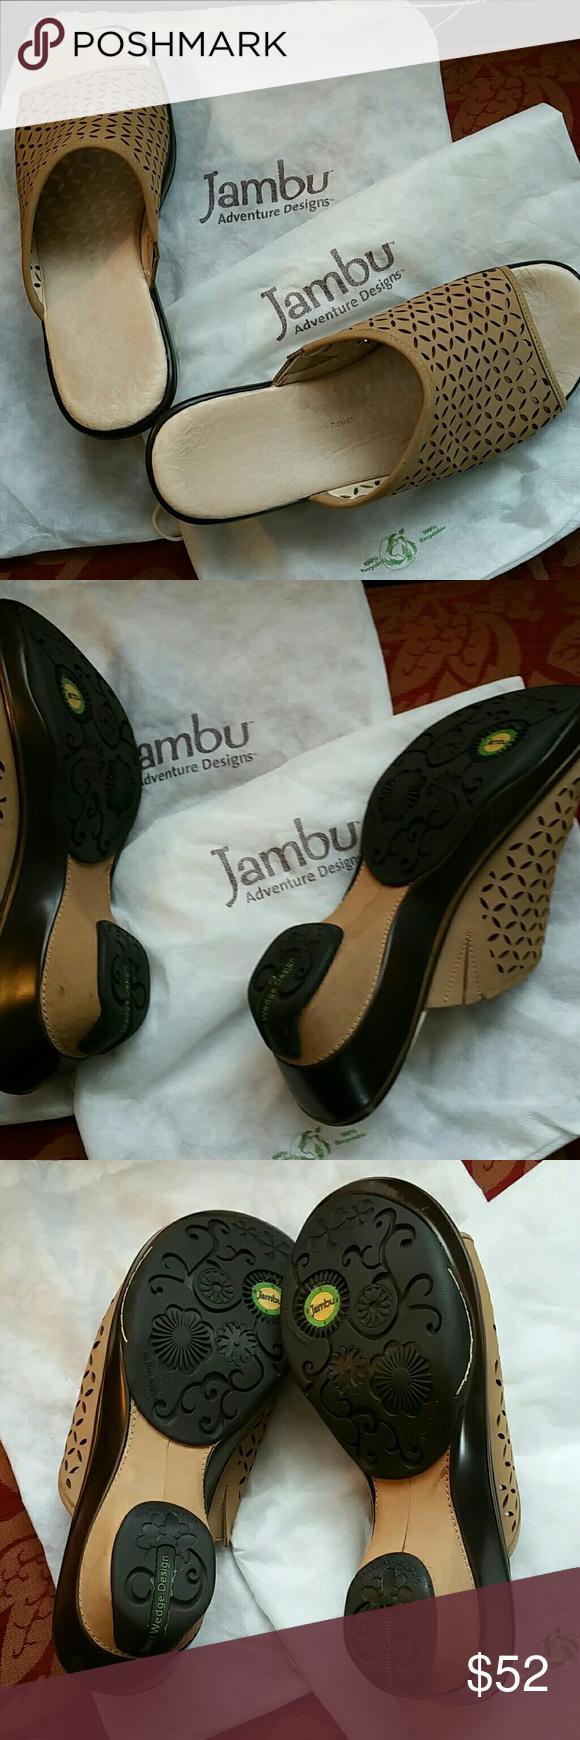 Jambu Fashionable Slip on Sandals Cream sand Jambu slip on sandals worn 3 times jambu Shoes Sandals